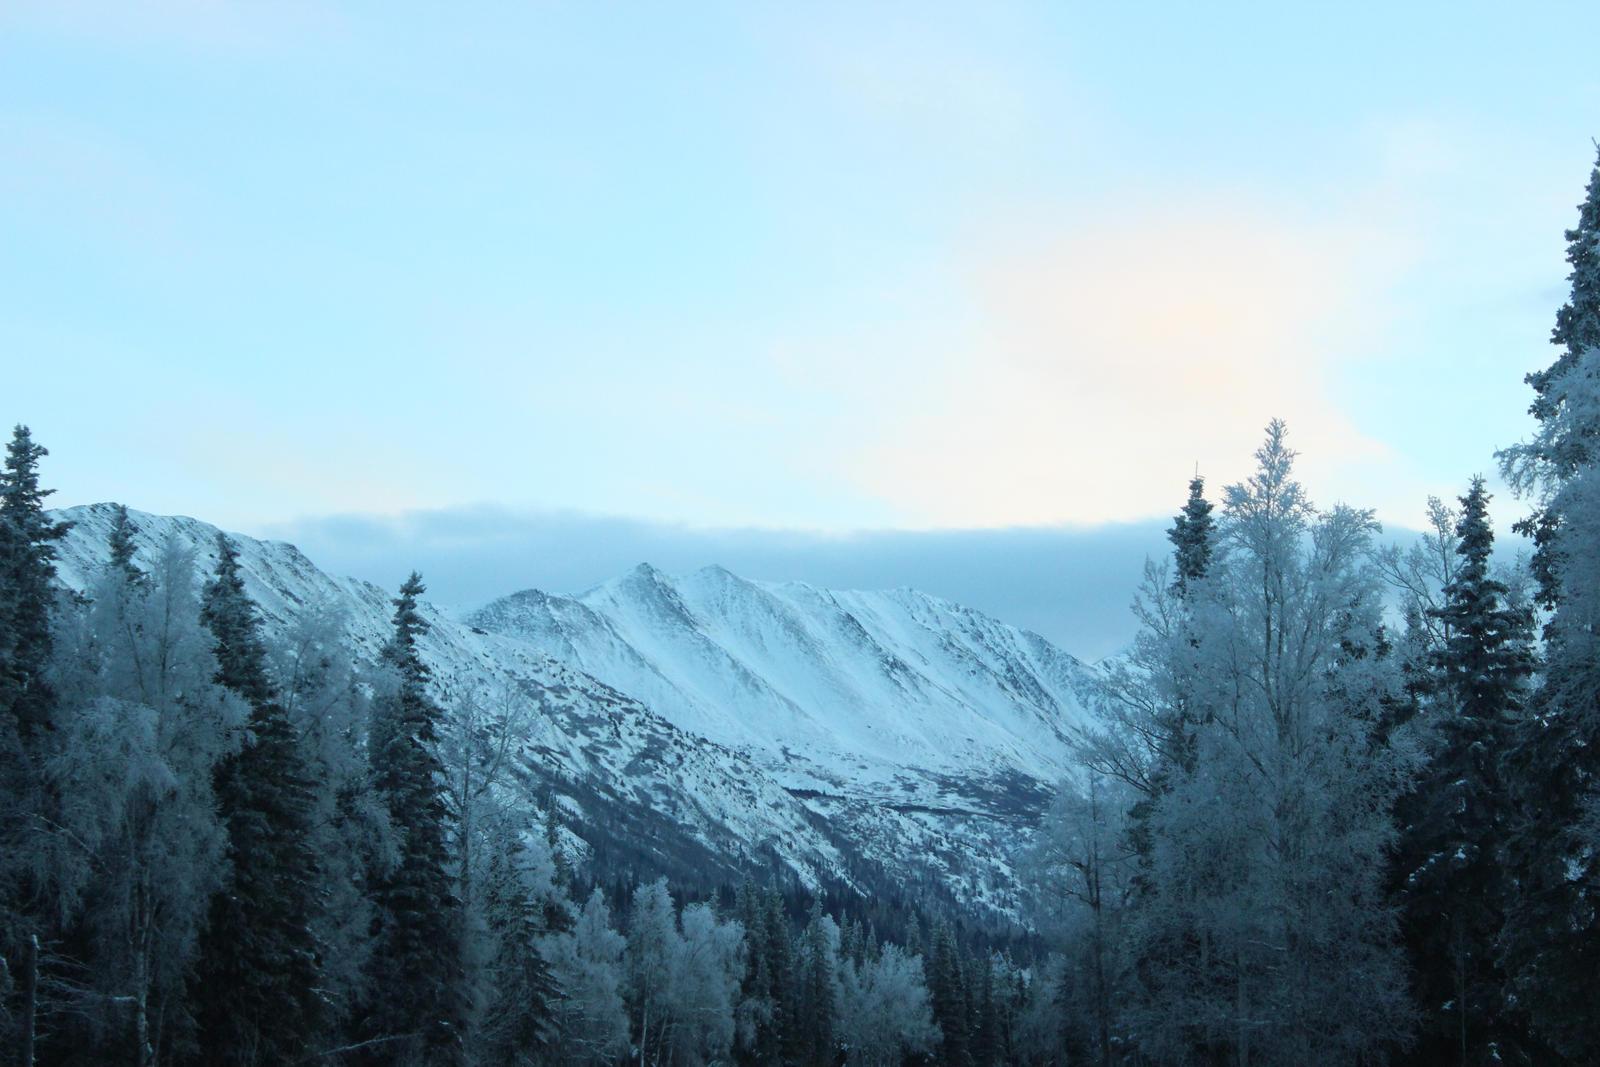 Alaska Mountains 28 by xdancingintherain